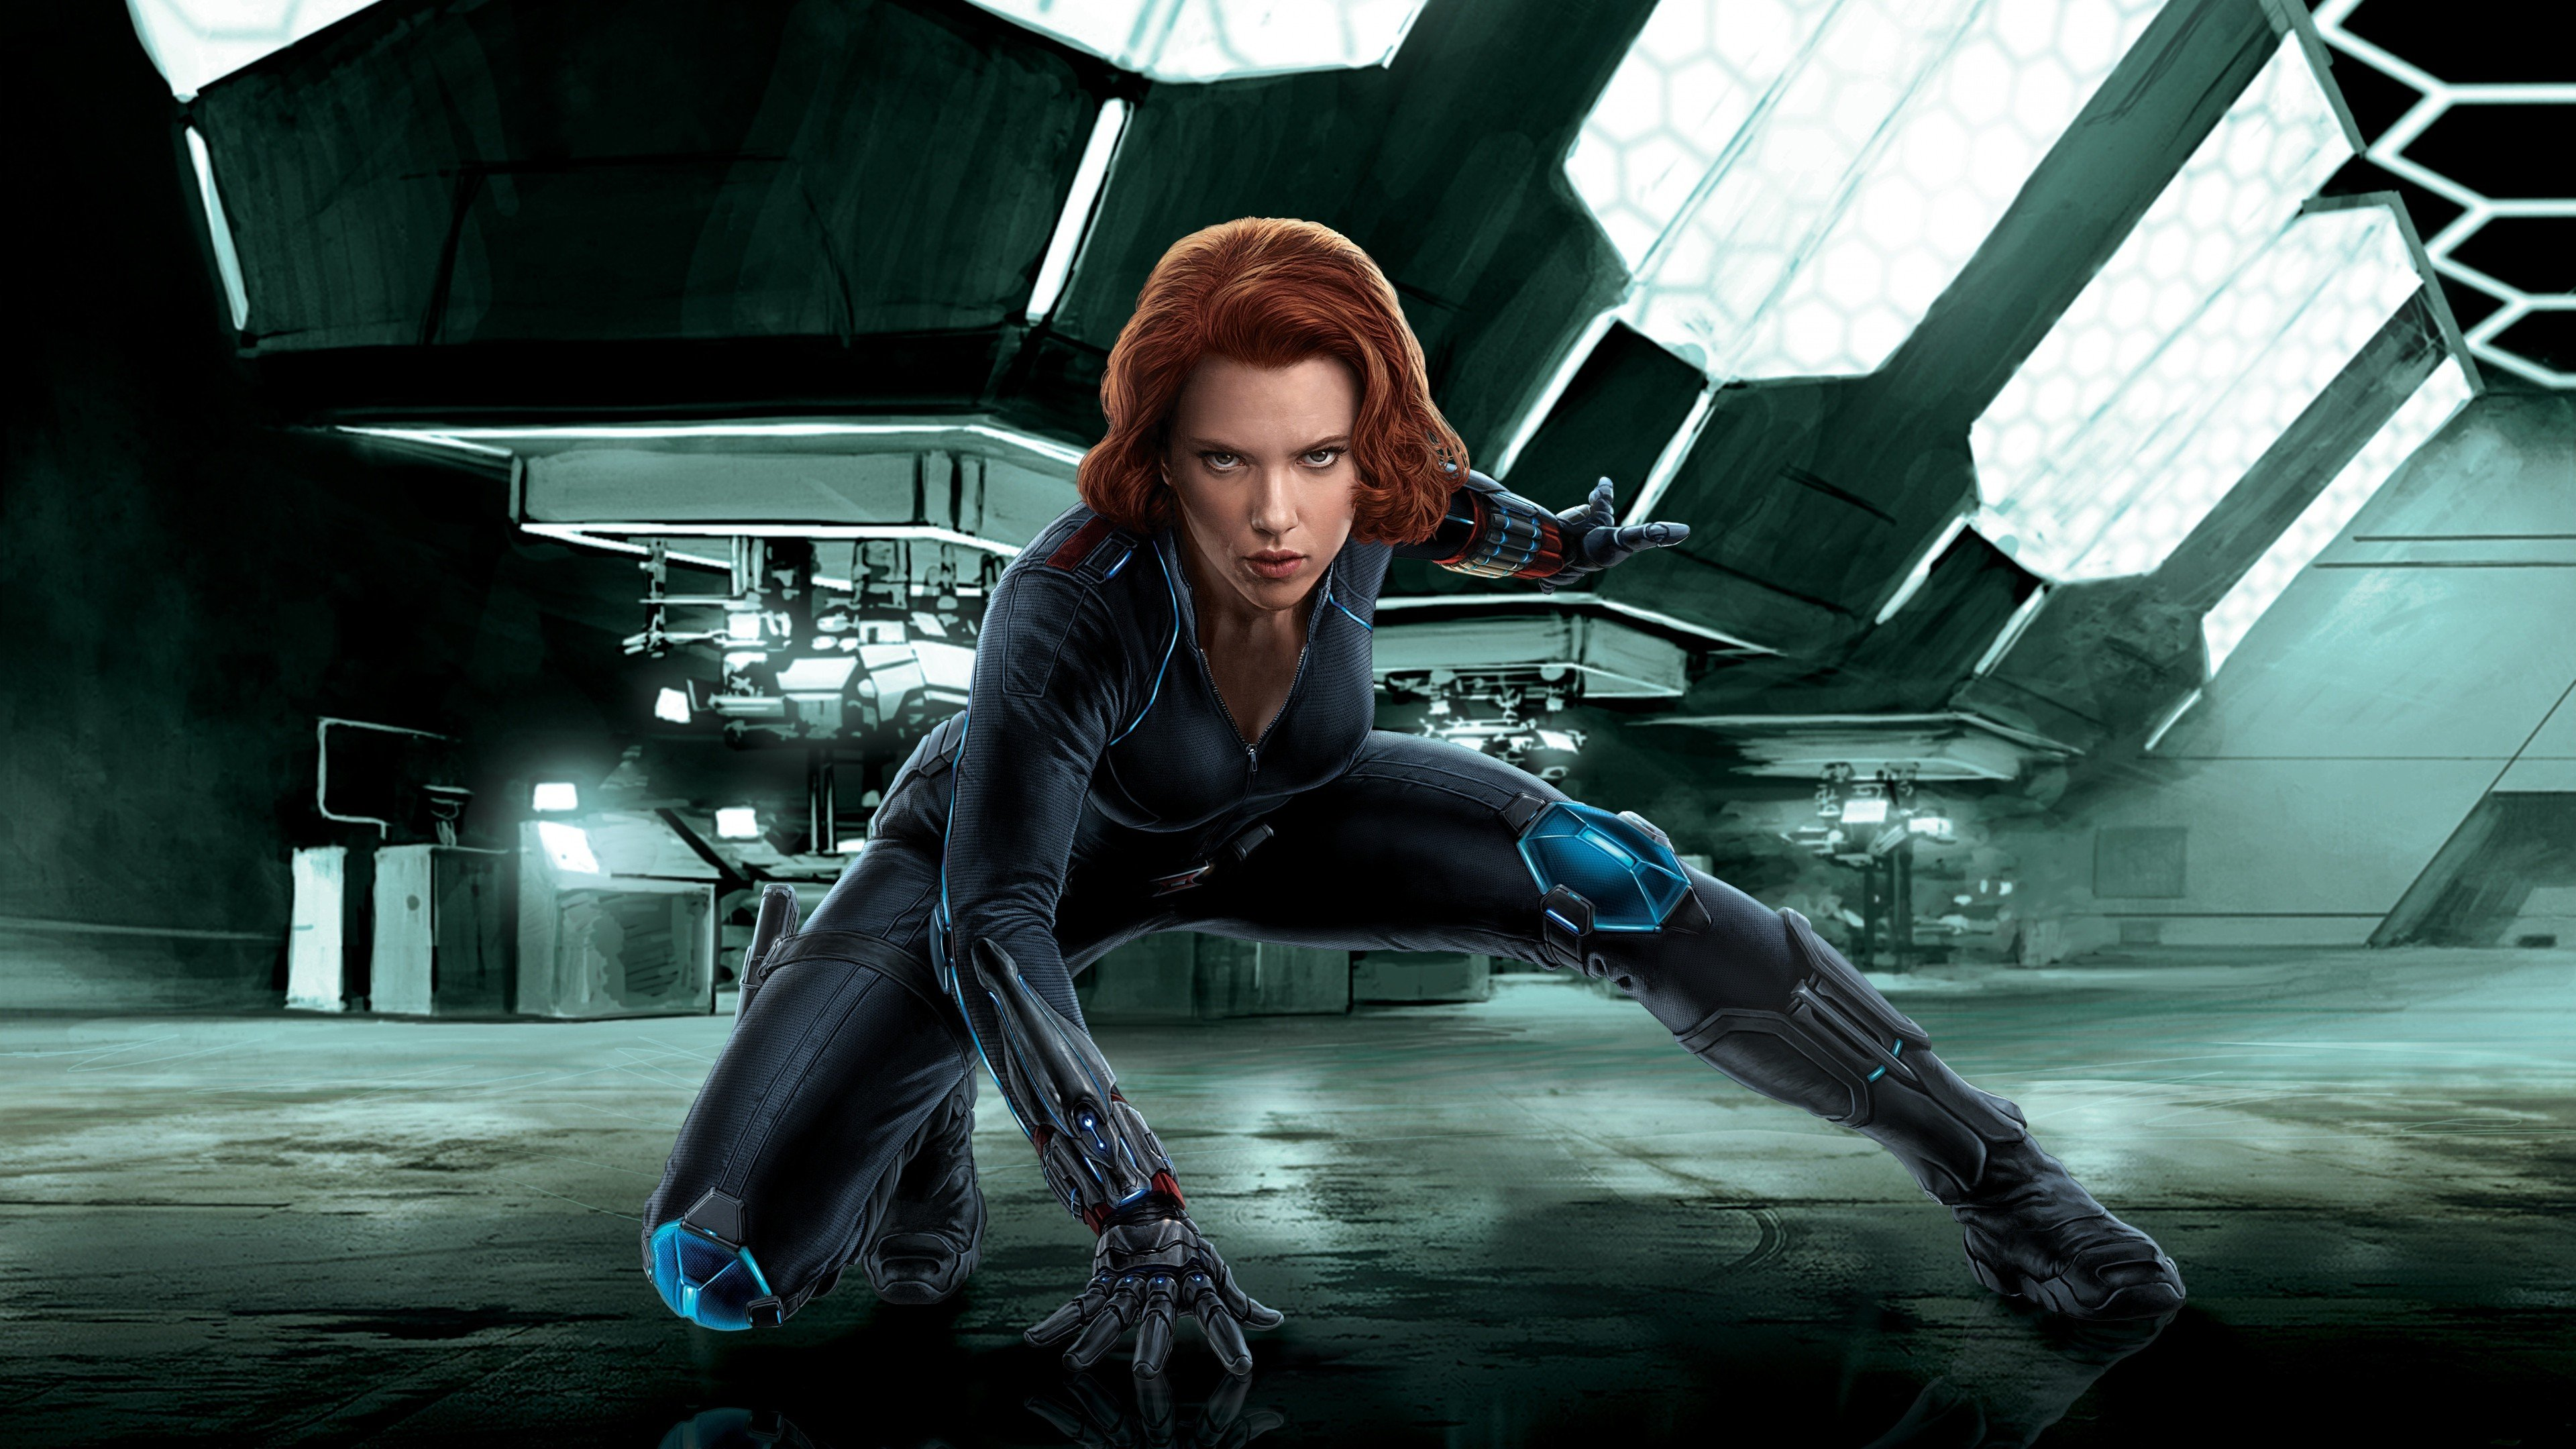 Black Widow, Scarlett Johansson, Redhead, Digital art, The Avengers, Futuristic, Avengers: Age of Ultron, Marvel Comics, Superheroines, Artwork, Marvel Cinematic Universe Wallpaper